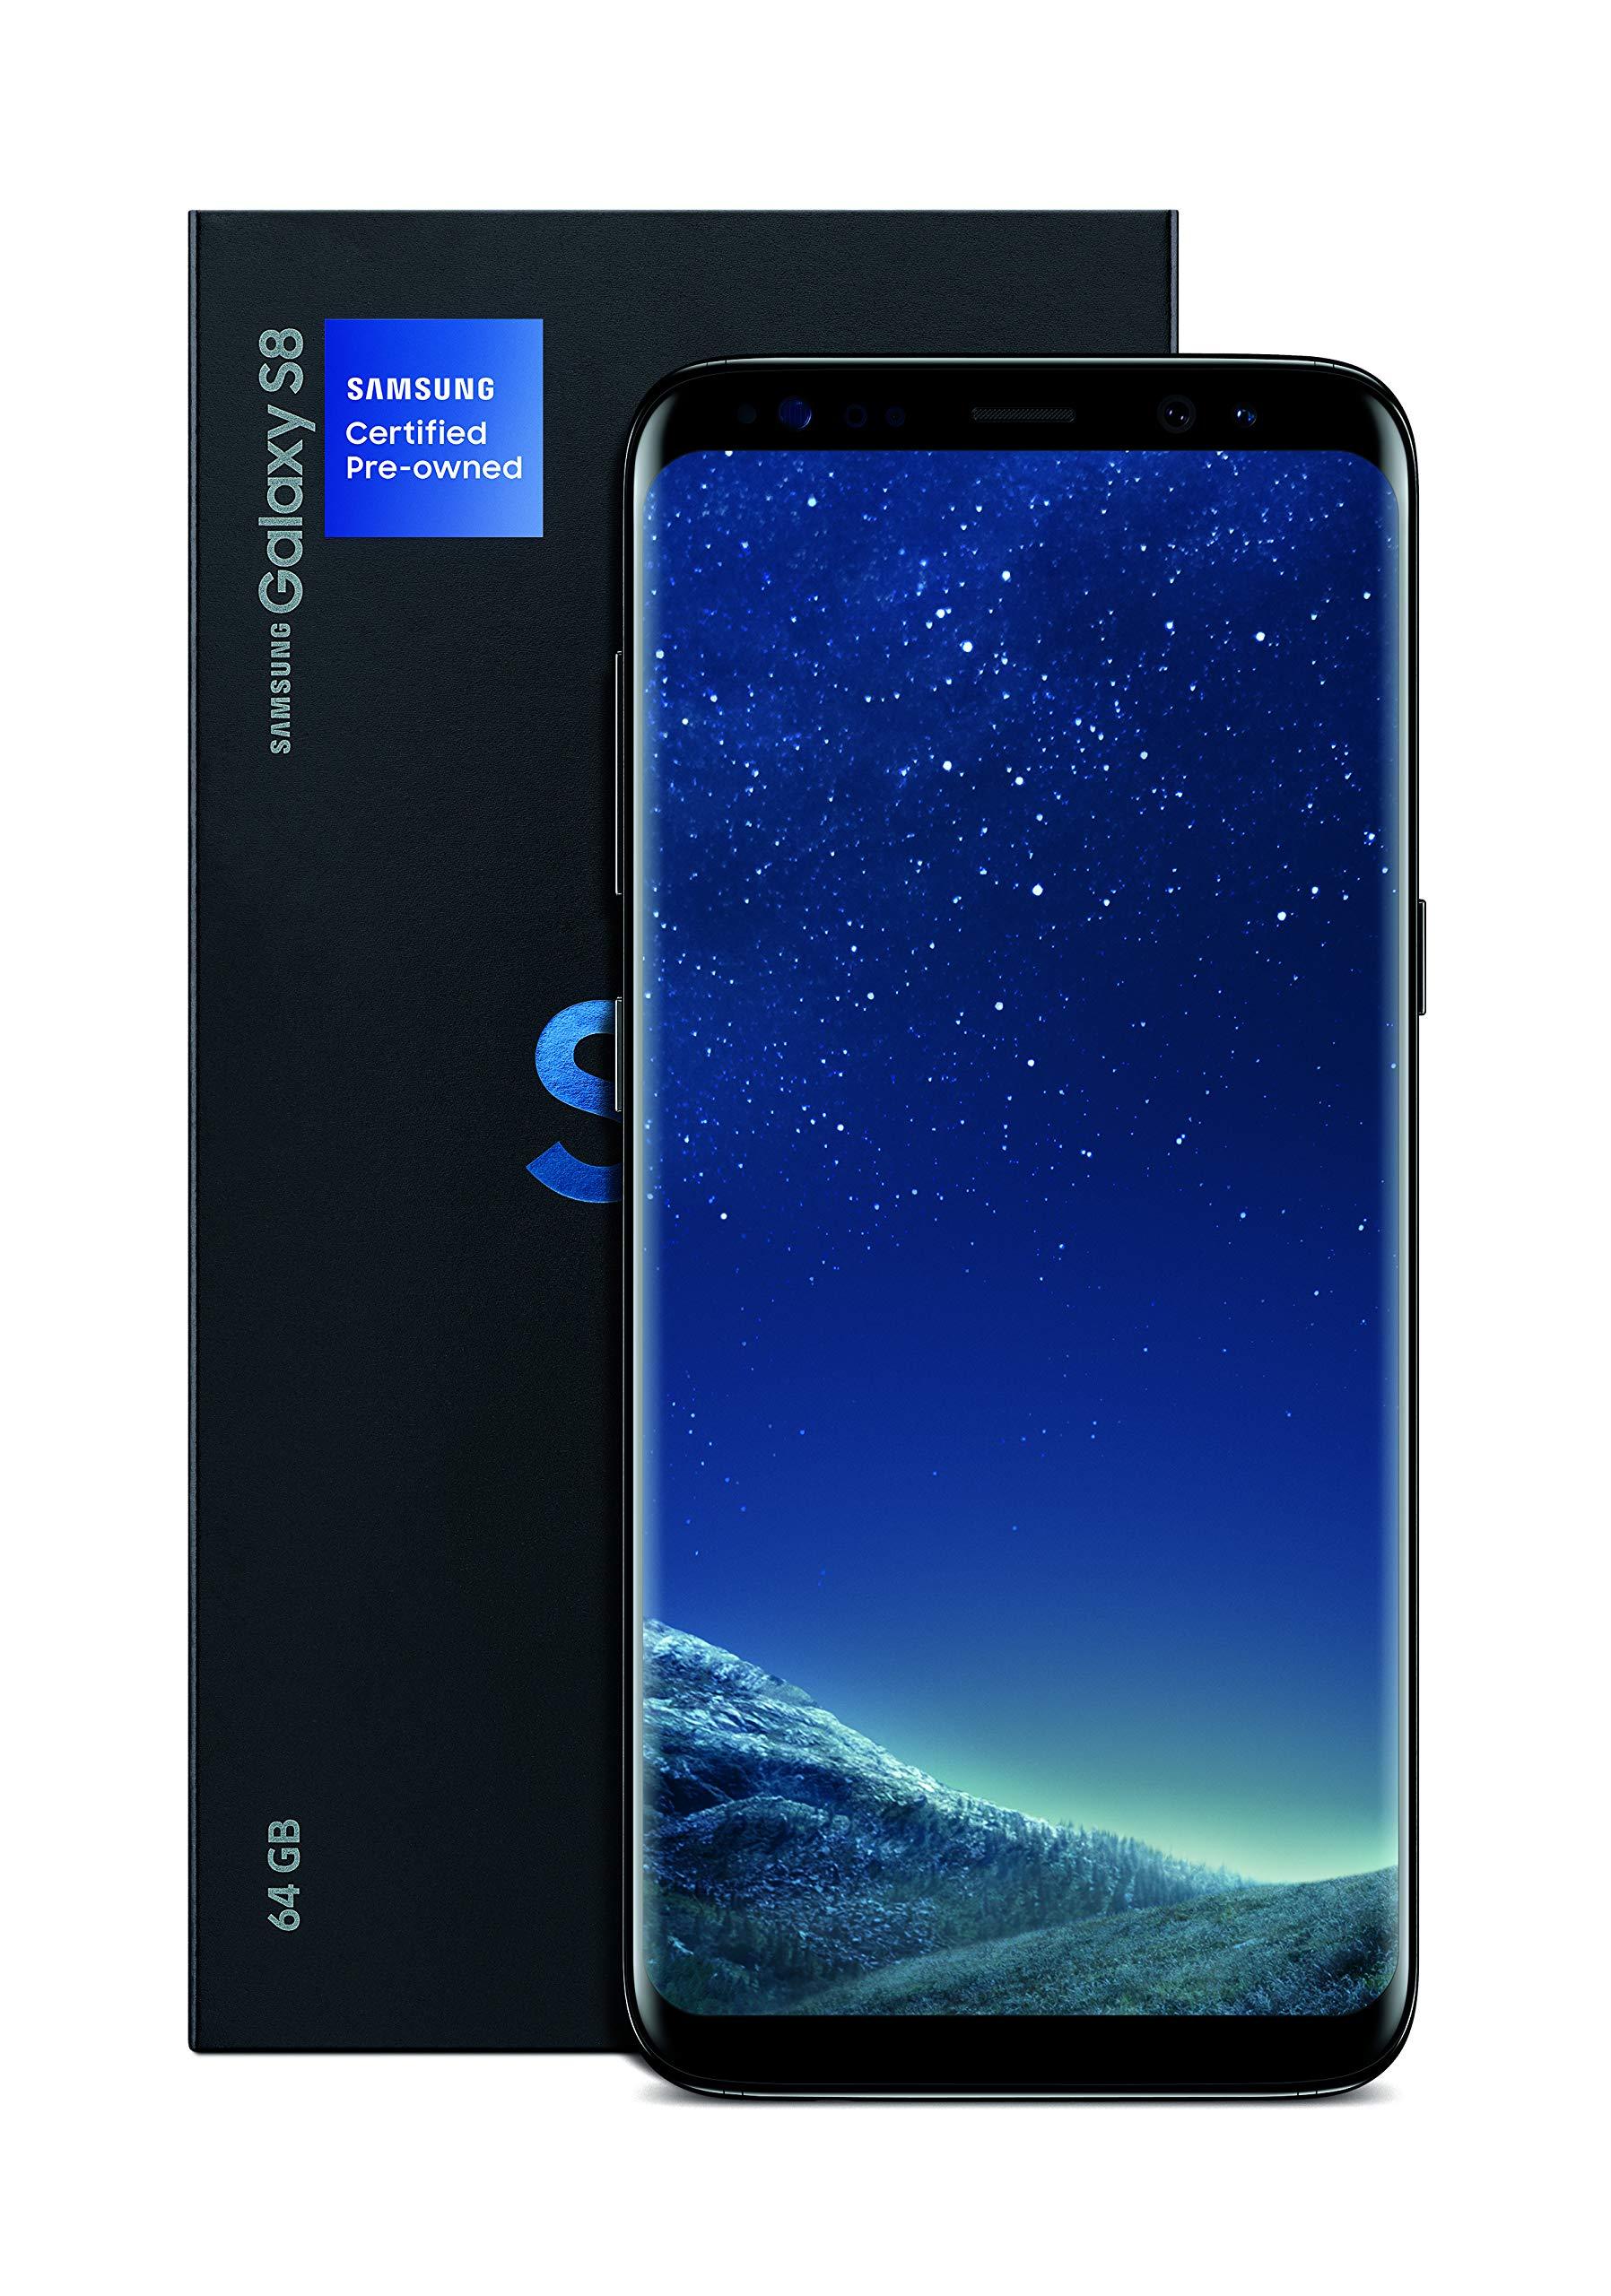 Samsung Galaxy S8 Certified Pre-Owned Factory Unlocked Phone – 5.8Inch Screen – 64GB – Midnight Black (U.S. Warranty) (Renewed)